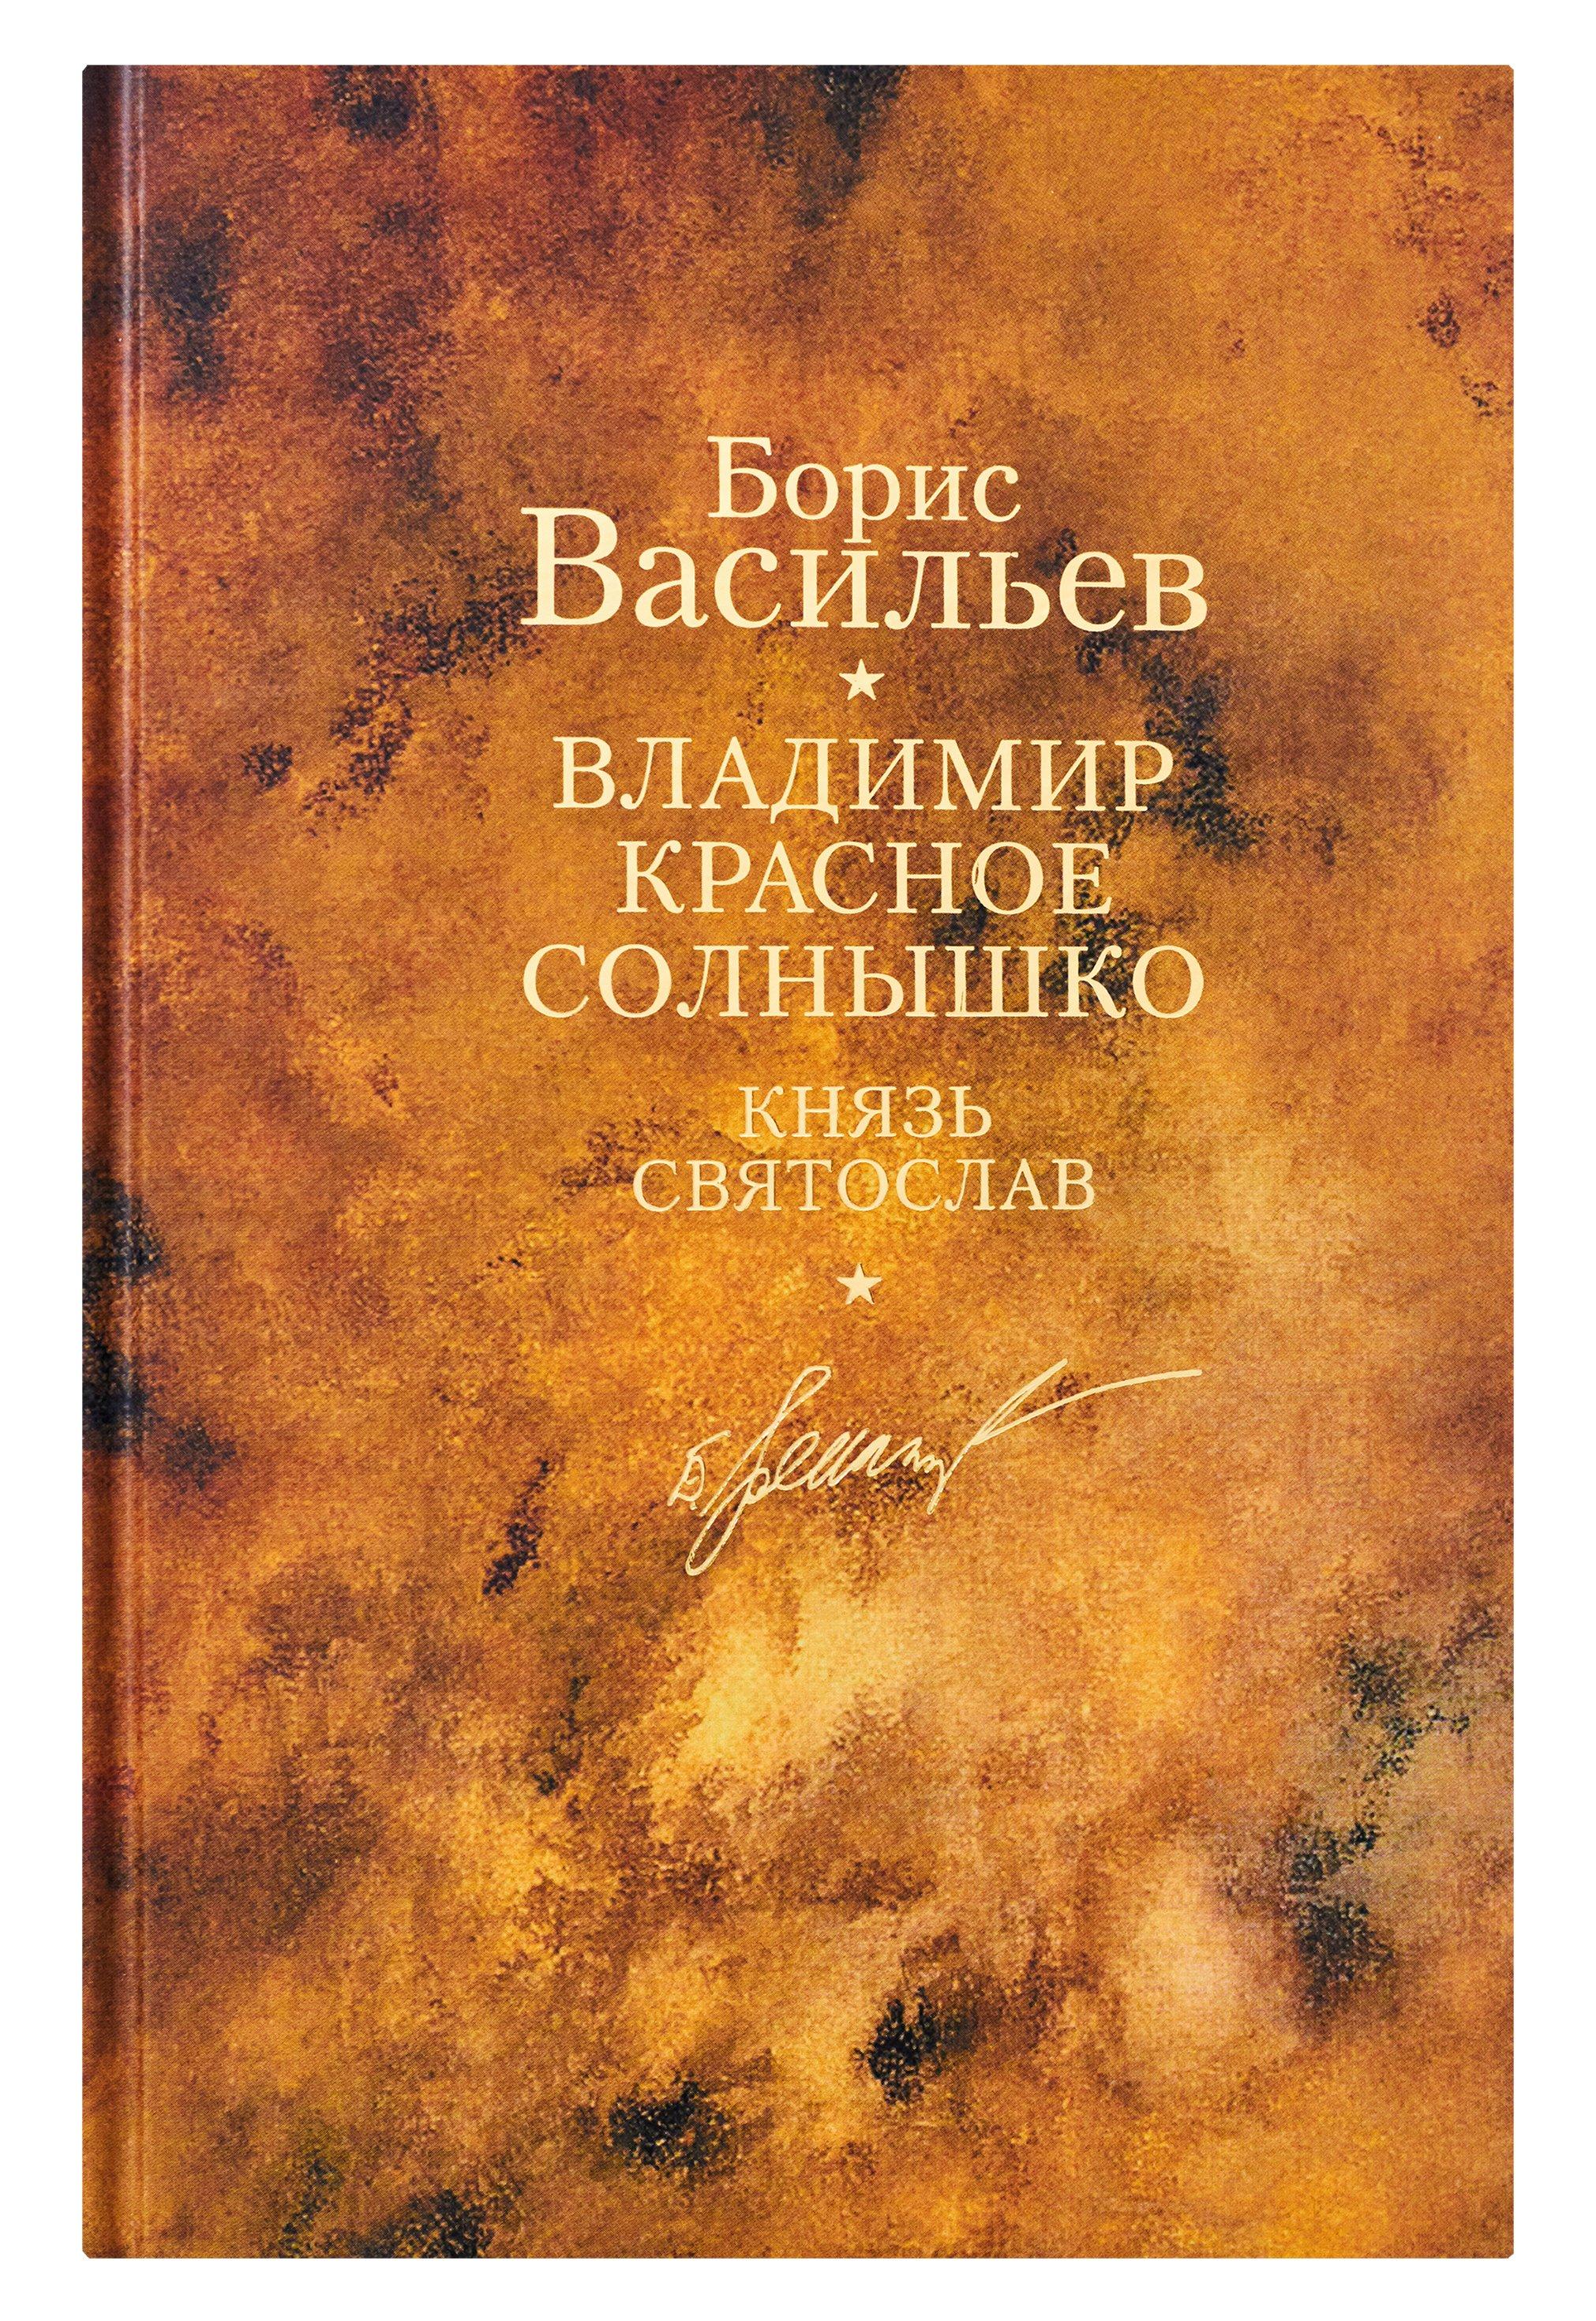 Владимир Красное Солнышко; Князь Святослав. Васильев Борис Львович